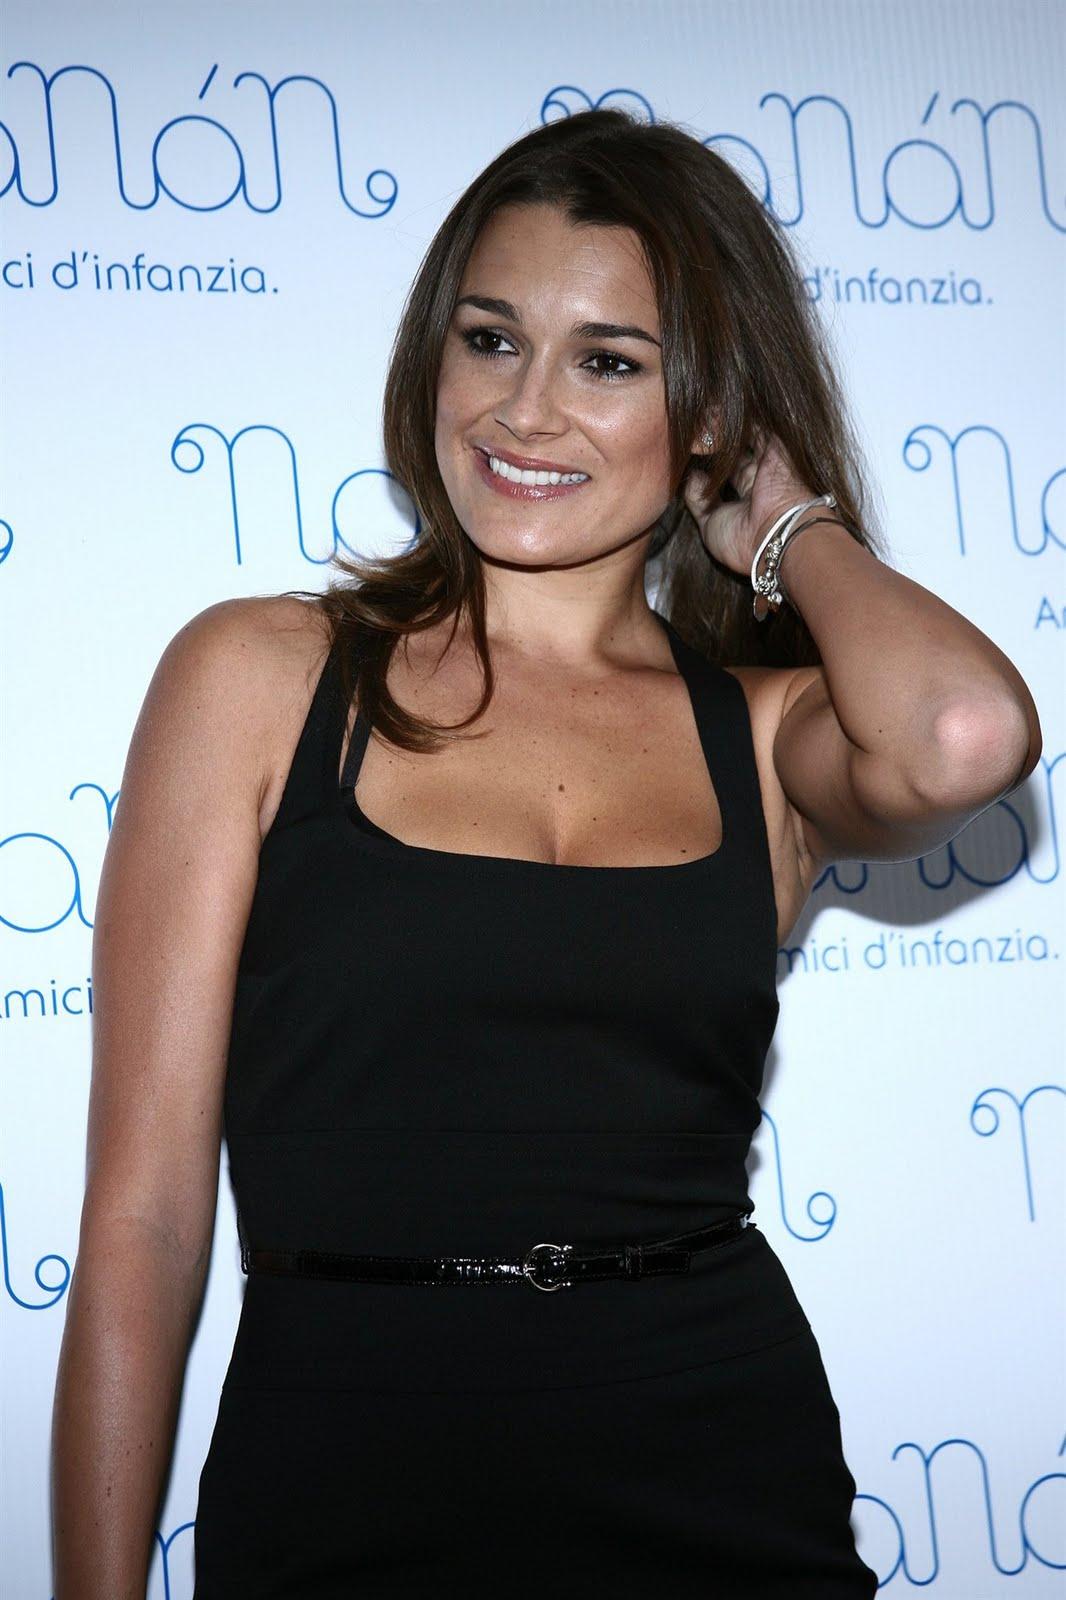 Celebrity Alena Seredova nude (54 foto and video), Tits, Fappening, Instagram, legs 2006